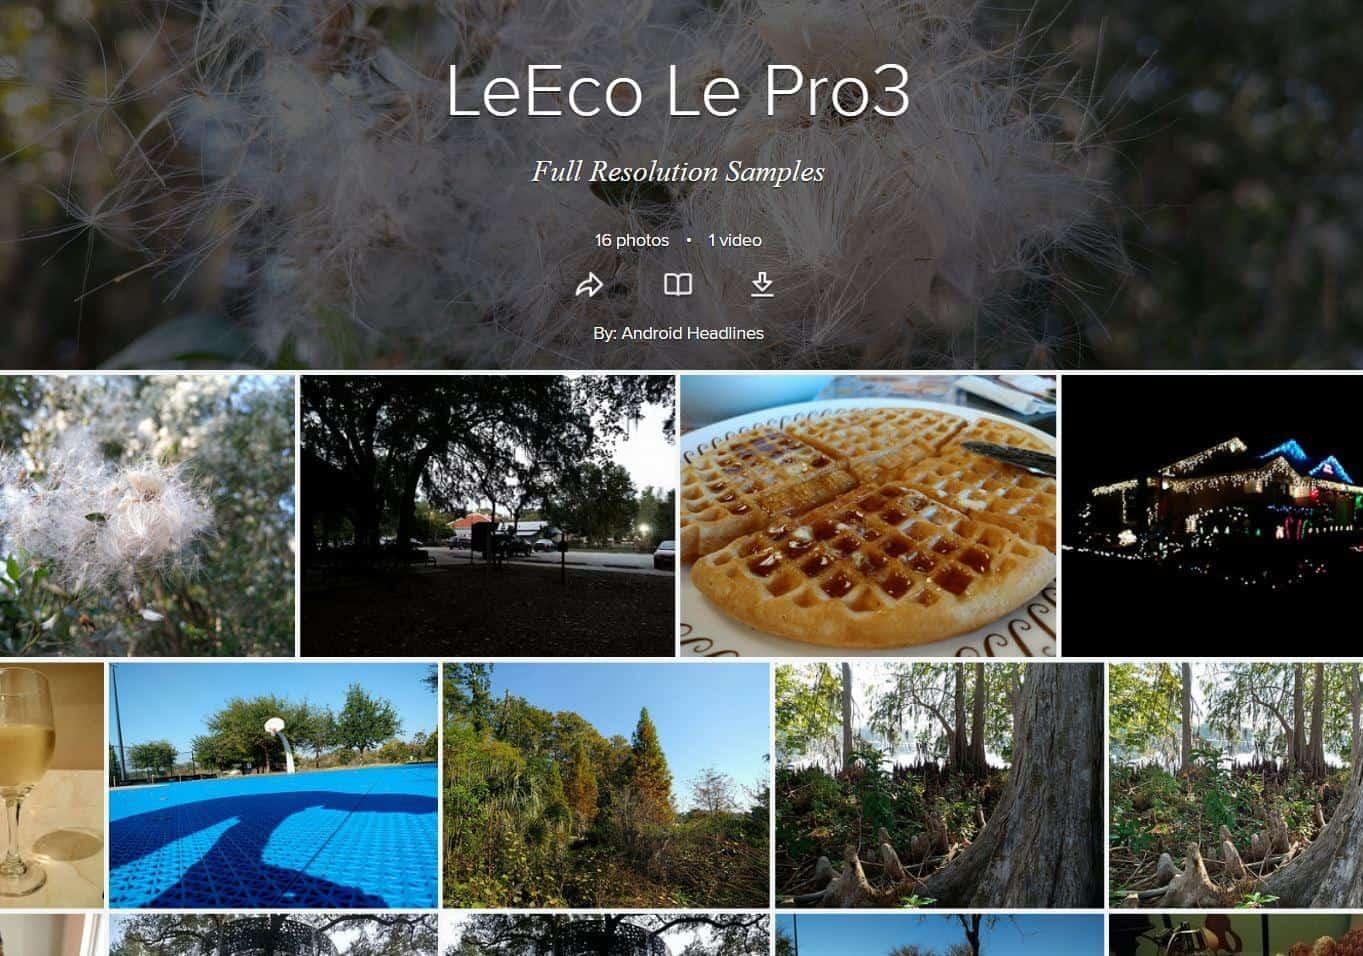 leeco-le-pro3-ah-ns-flickr